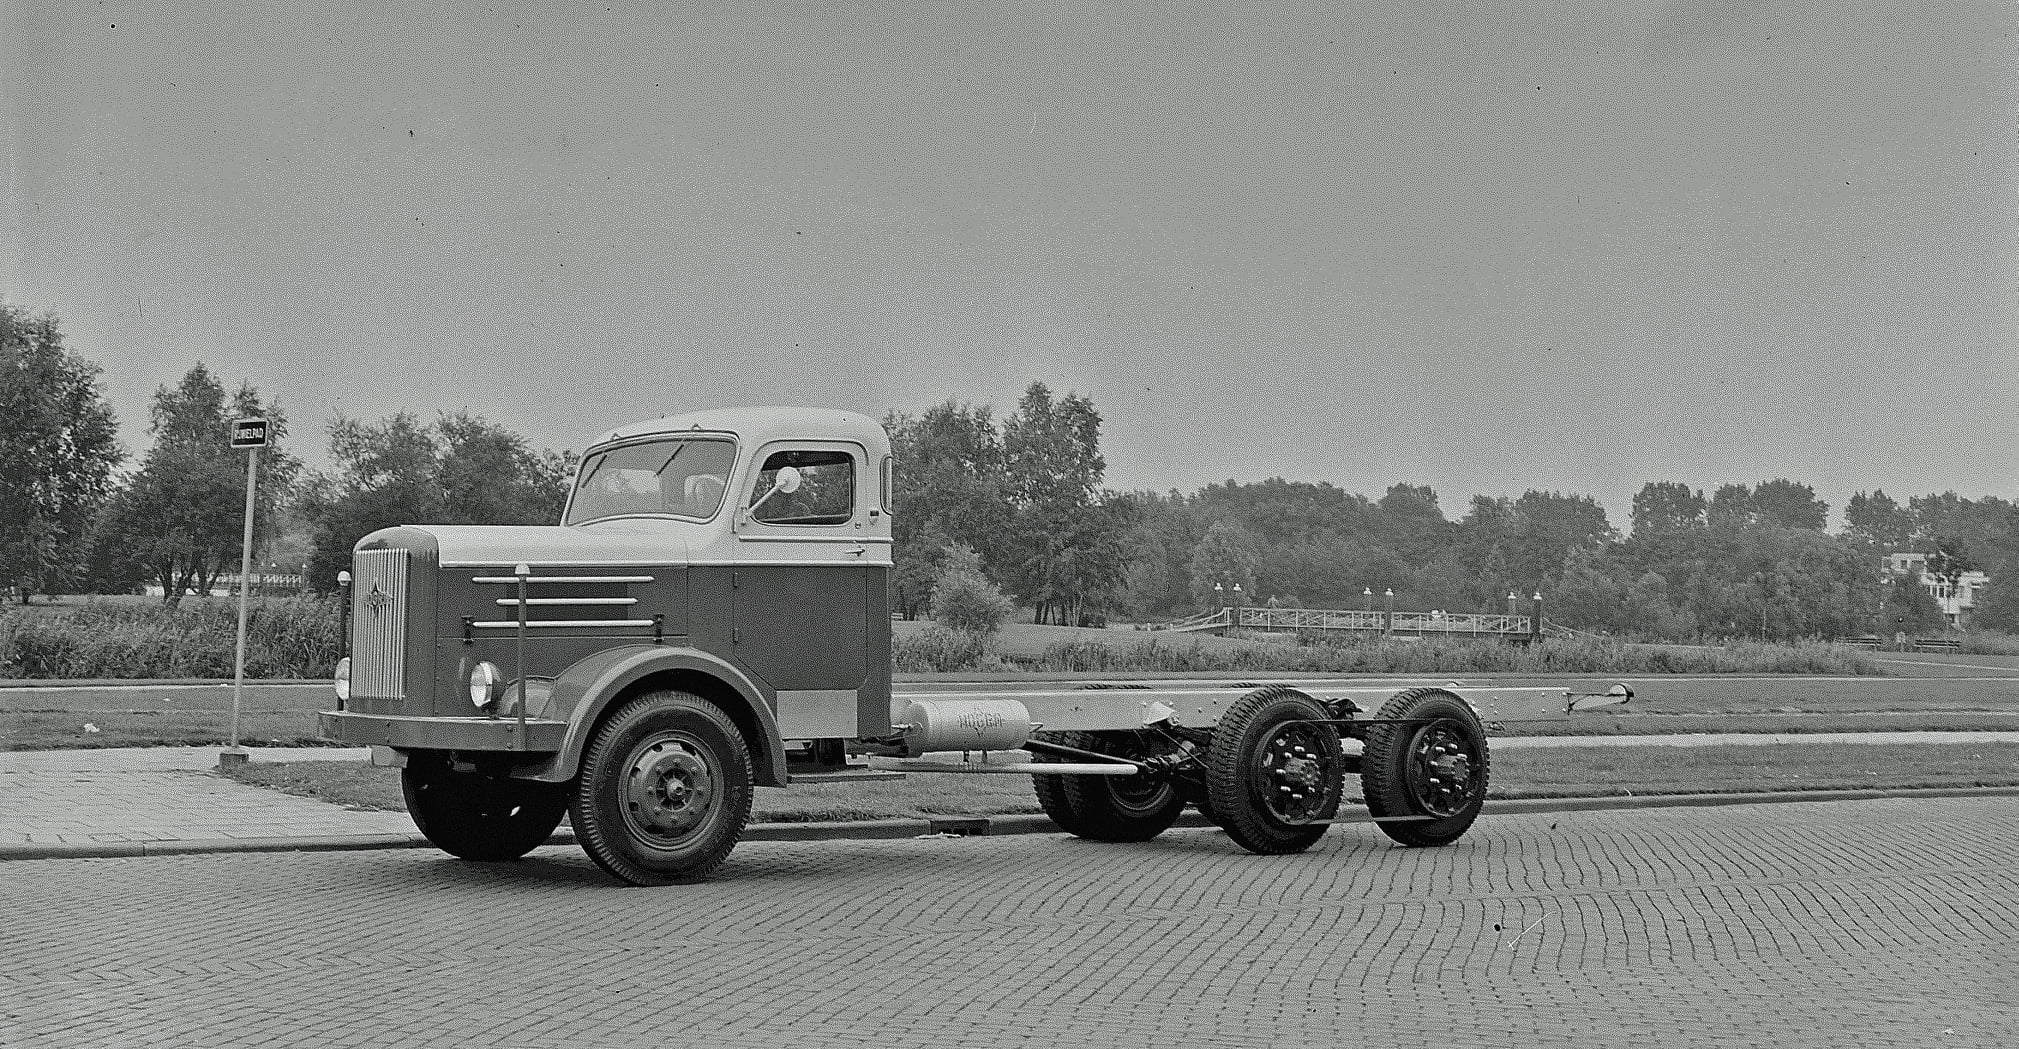 Hogra-1957-bij-Terlouw-autobedrijf-Rotterdam-semi-6X4